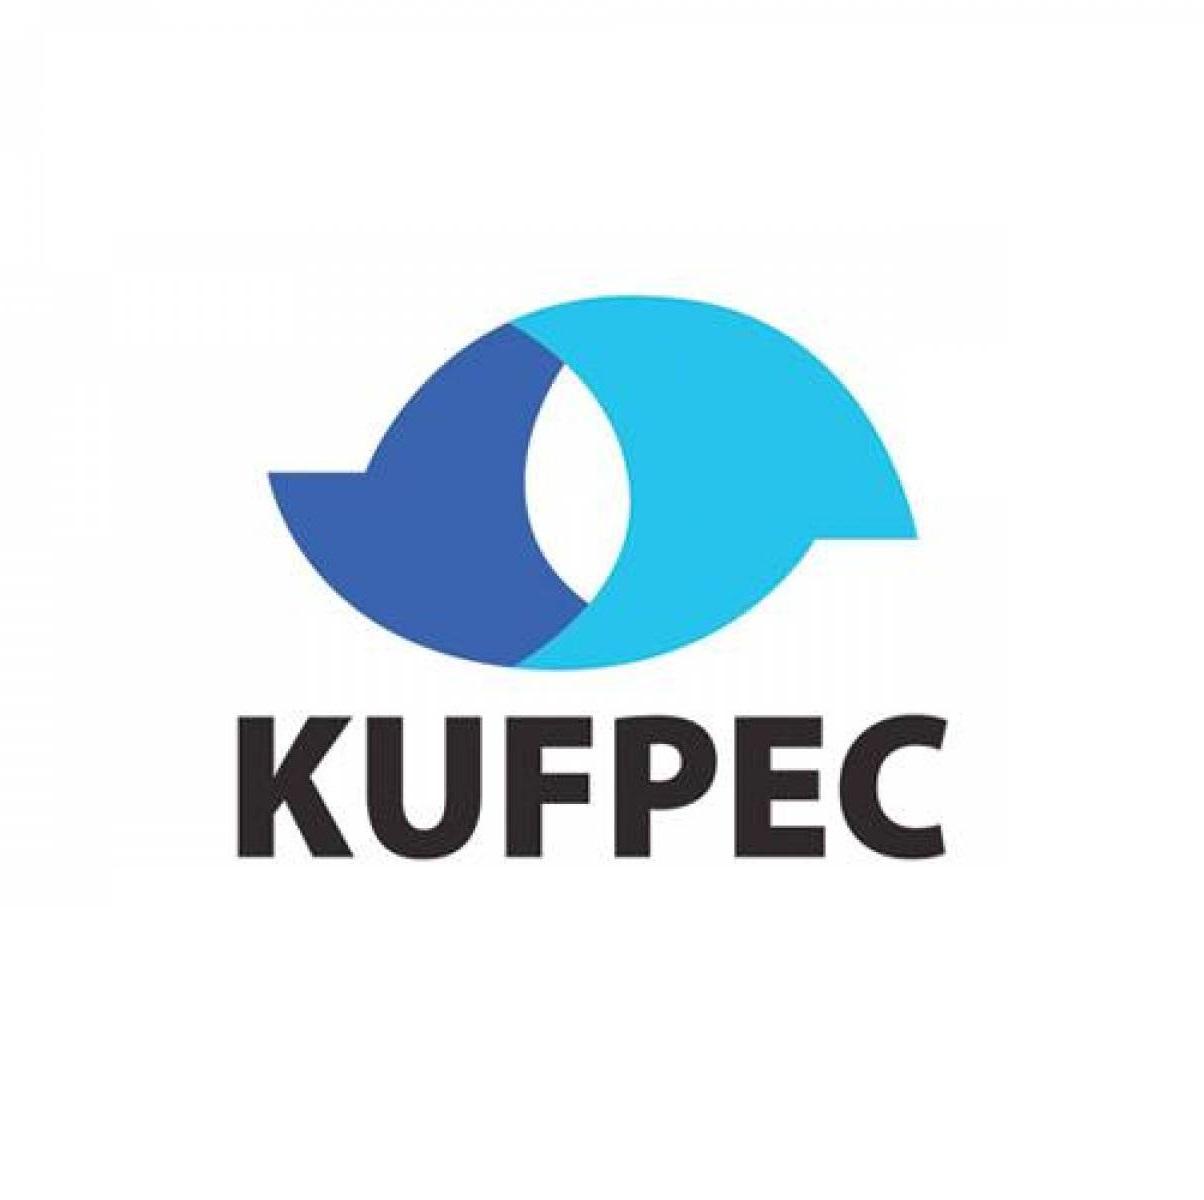 KUFPEC (EGYPT) LIMITED